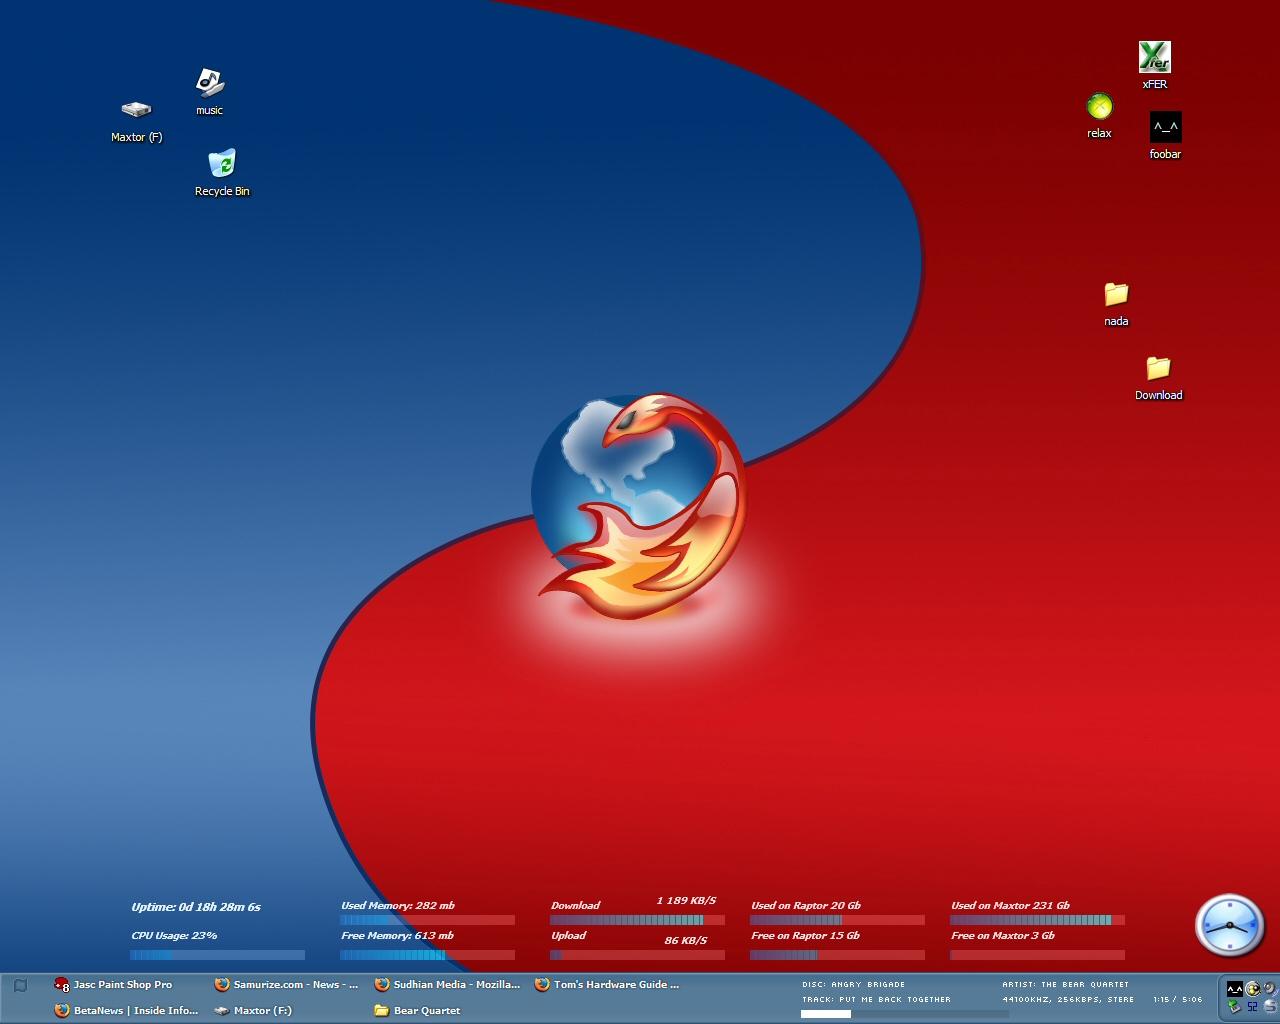 Title: Firefox